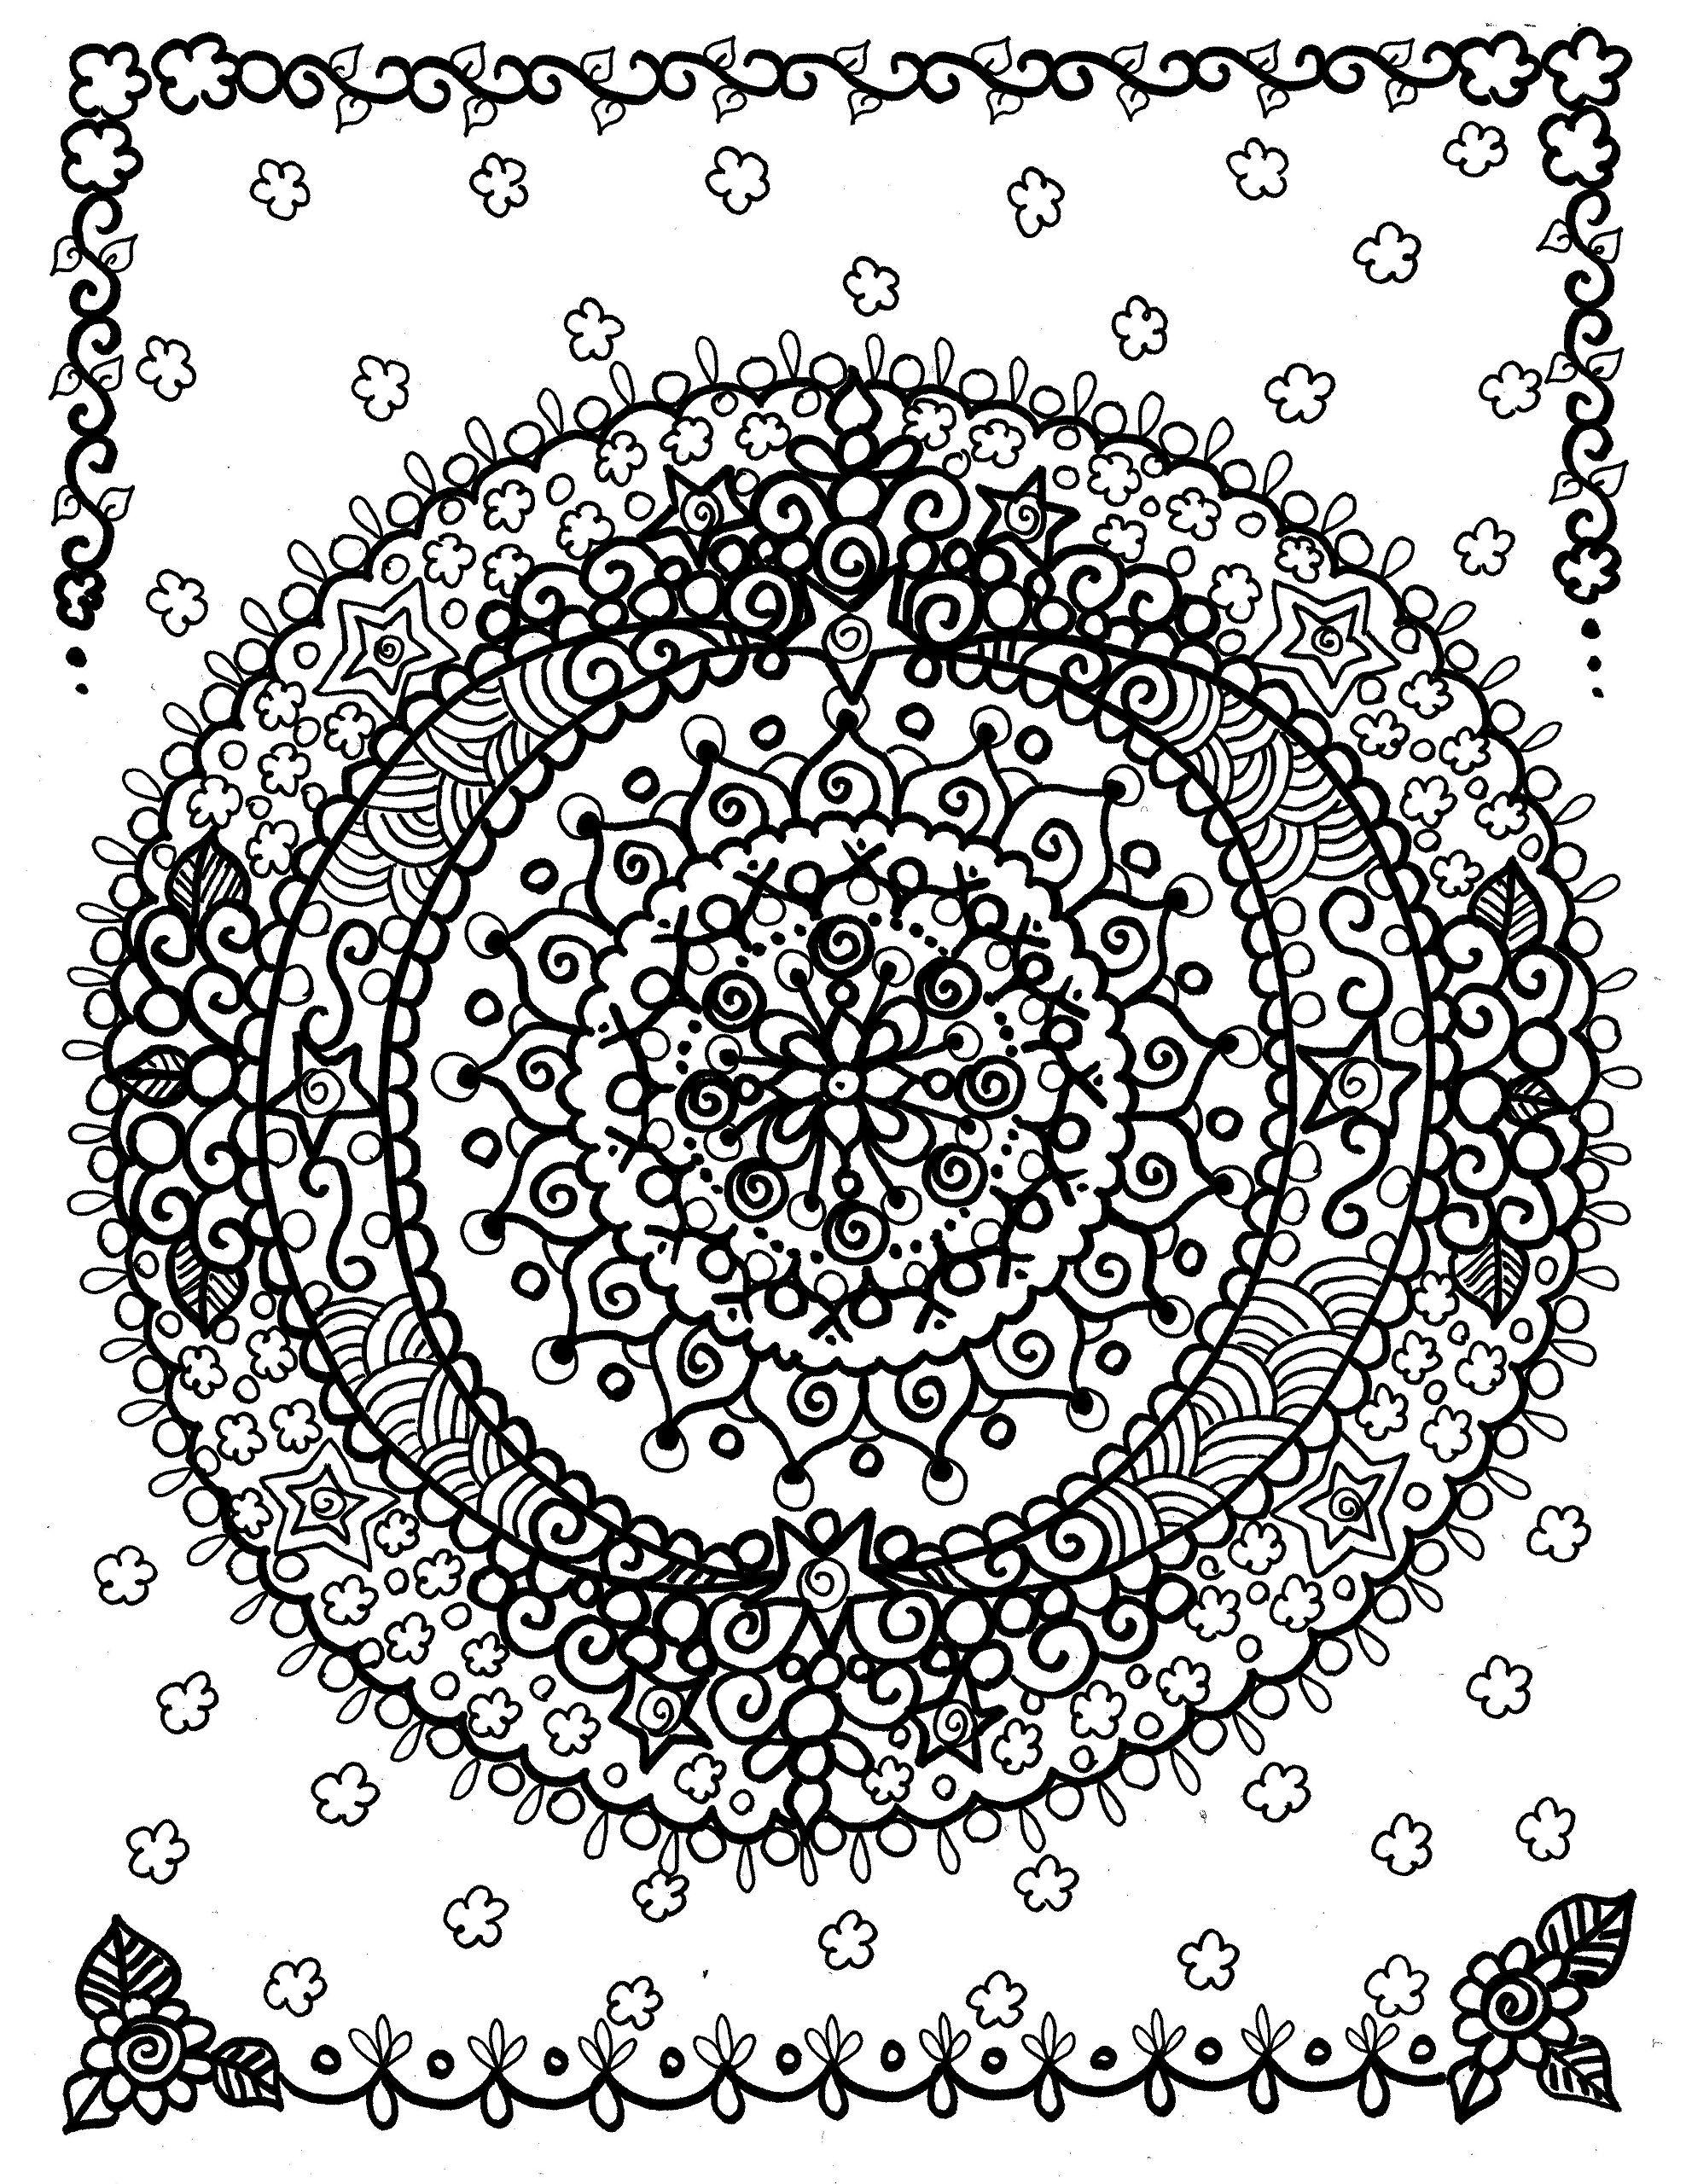 Zen dalas magic spiritual mandalas to help you relax deborah muller